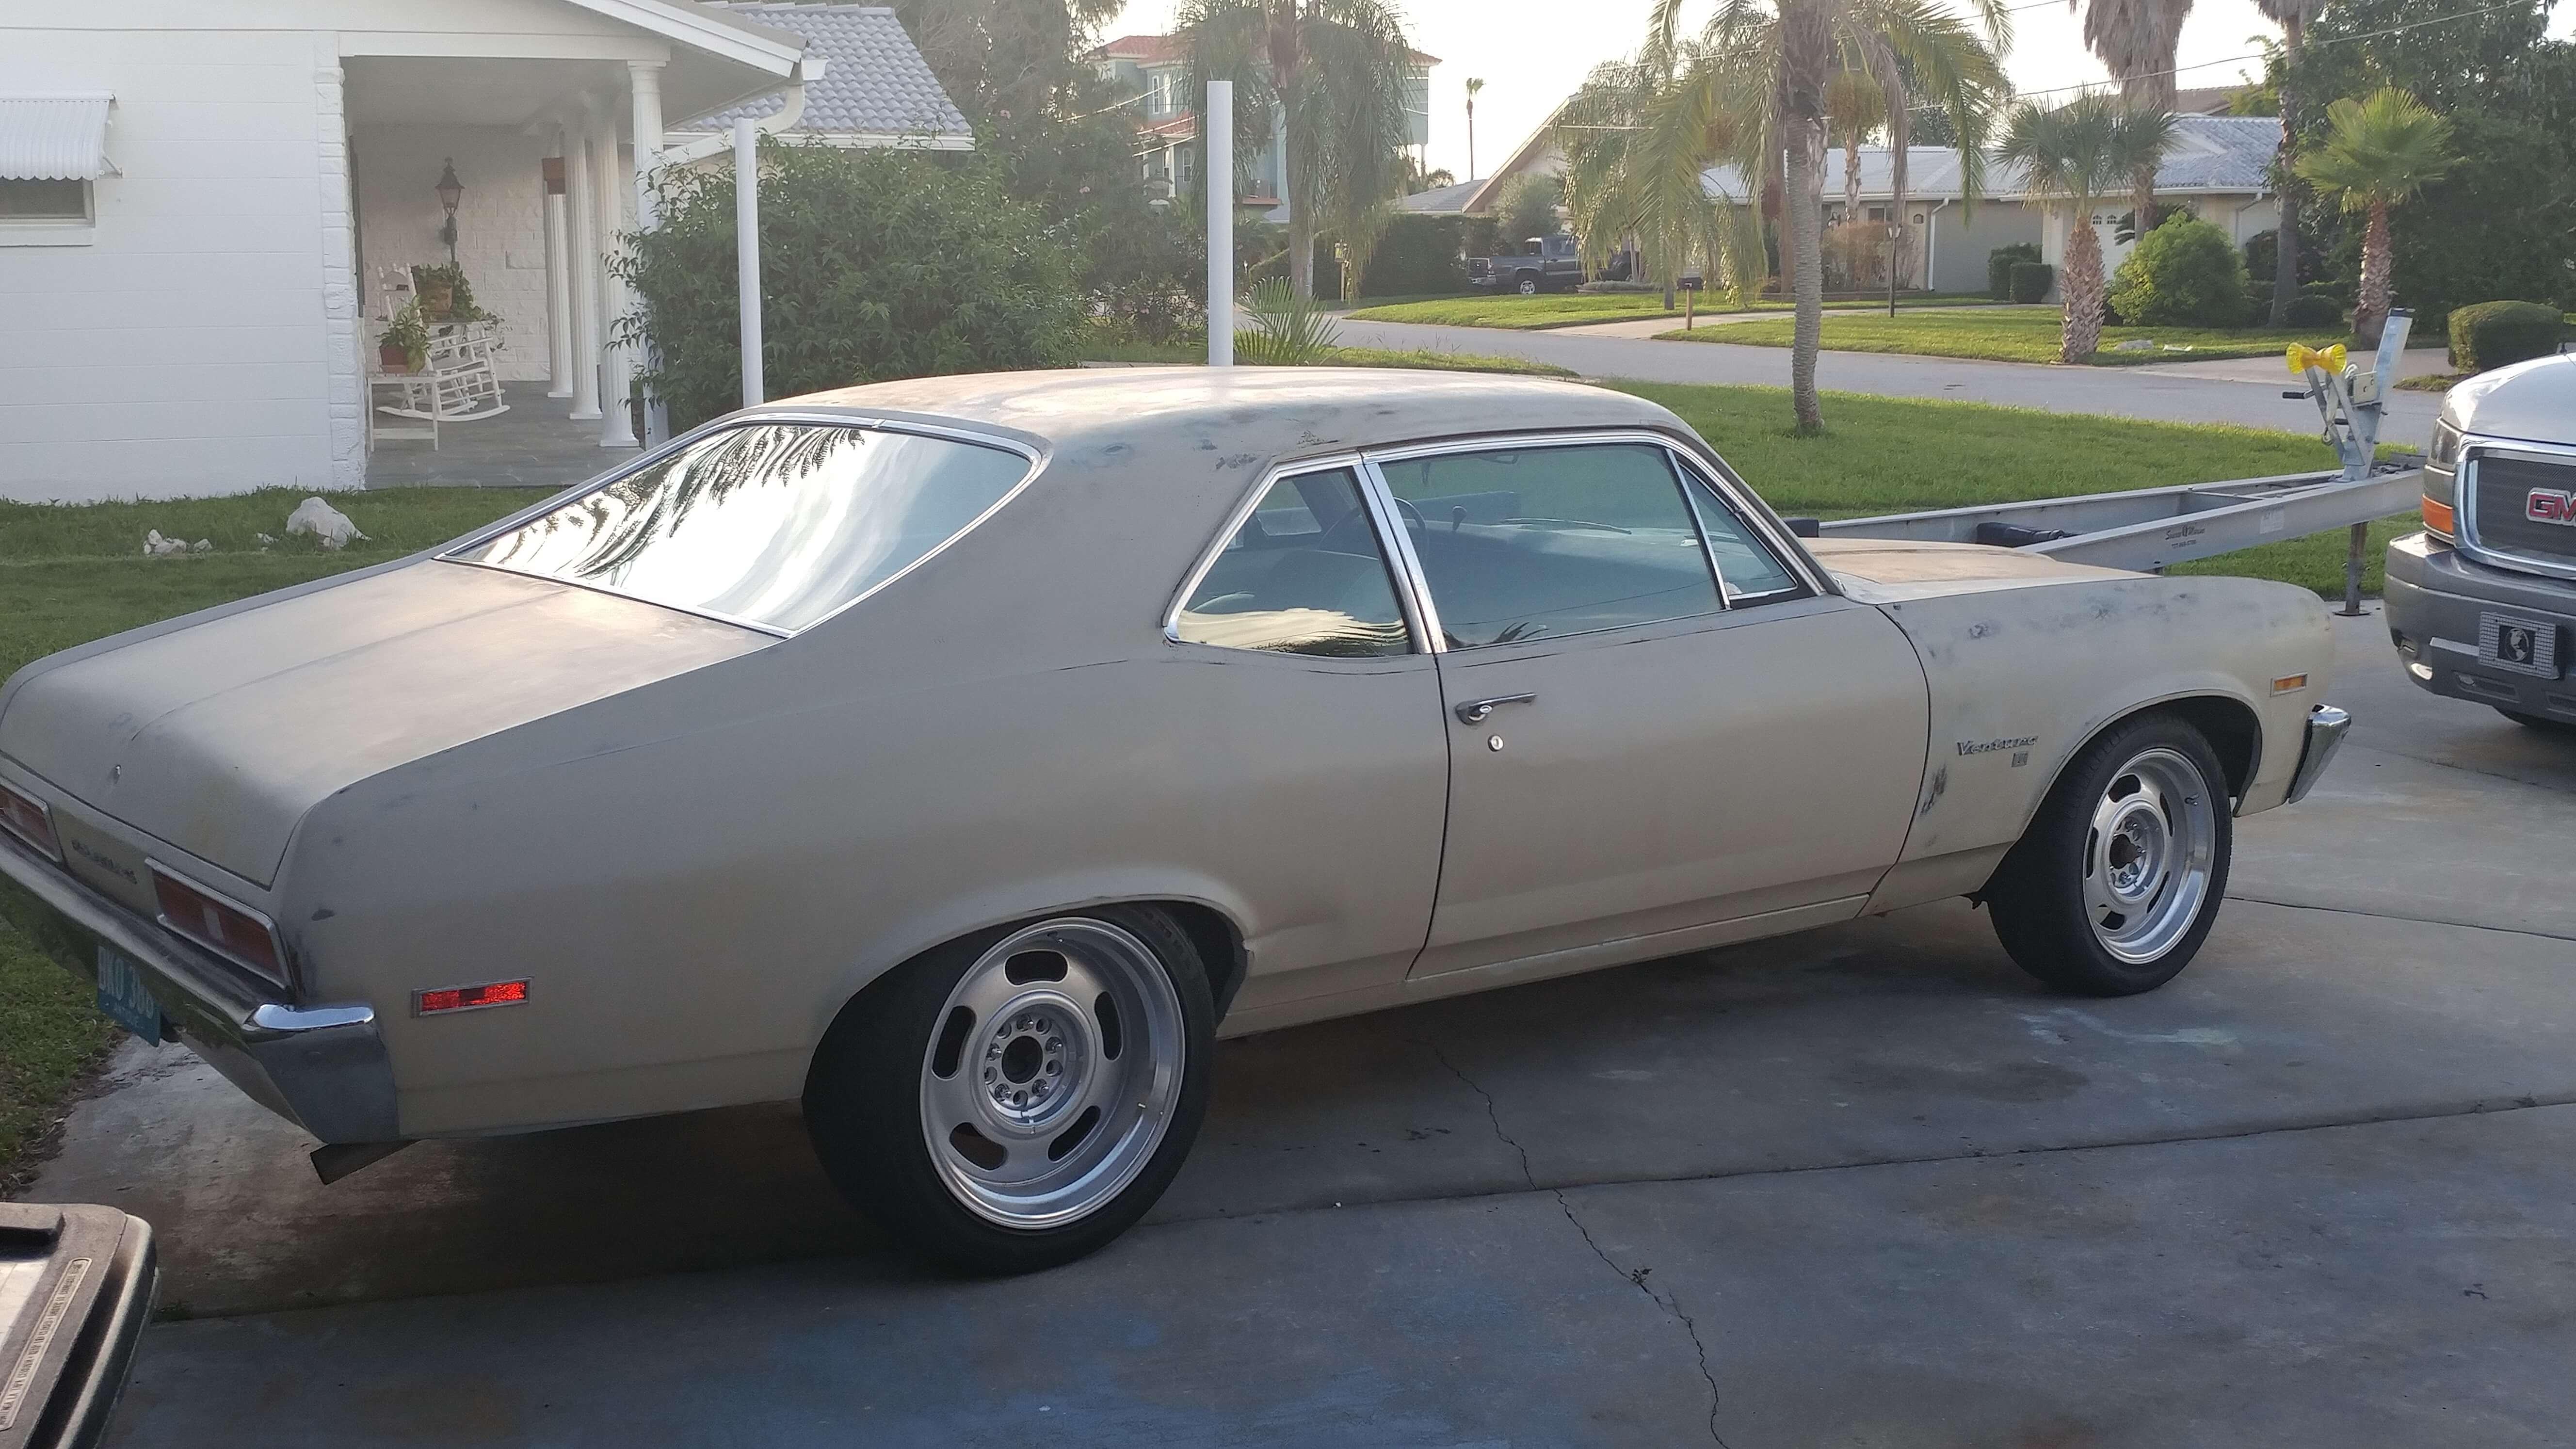 Troy S 1971 Pontiac Ventura Holley My Garage